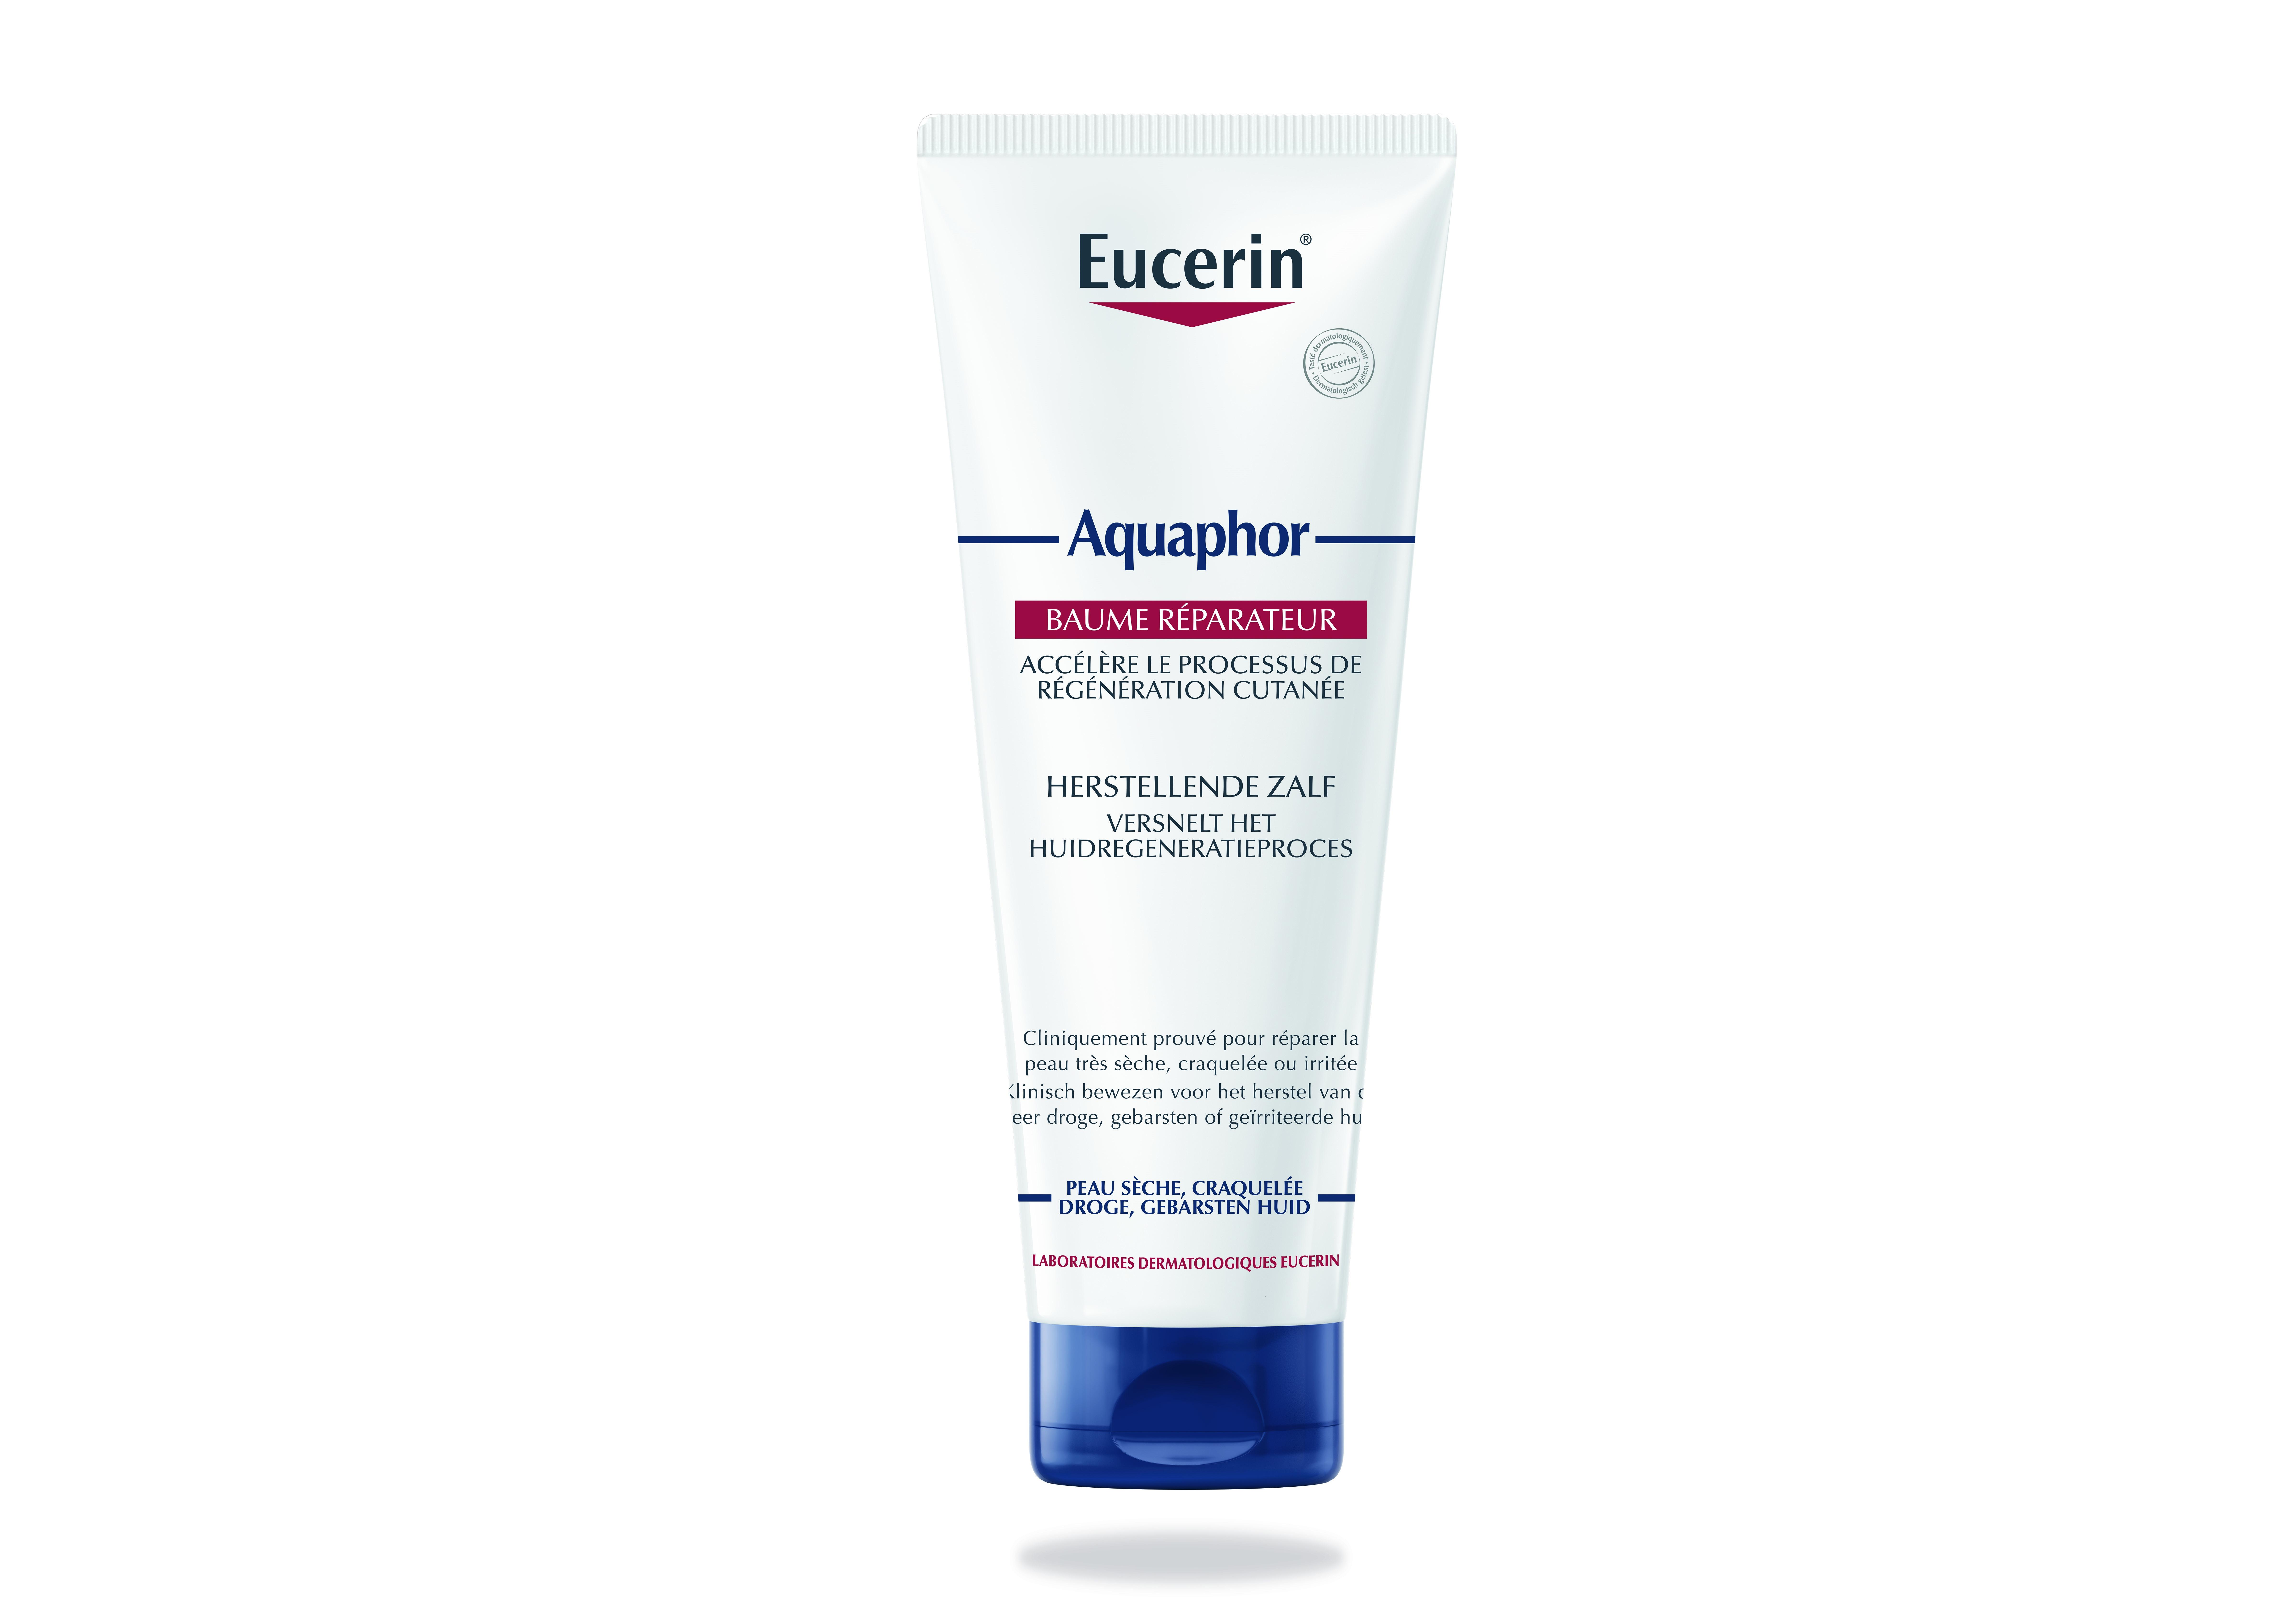 Baume Aquaphore Eucerin